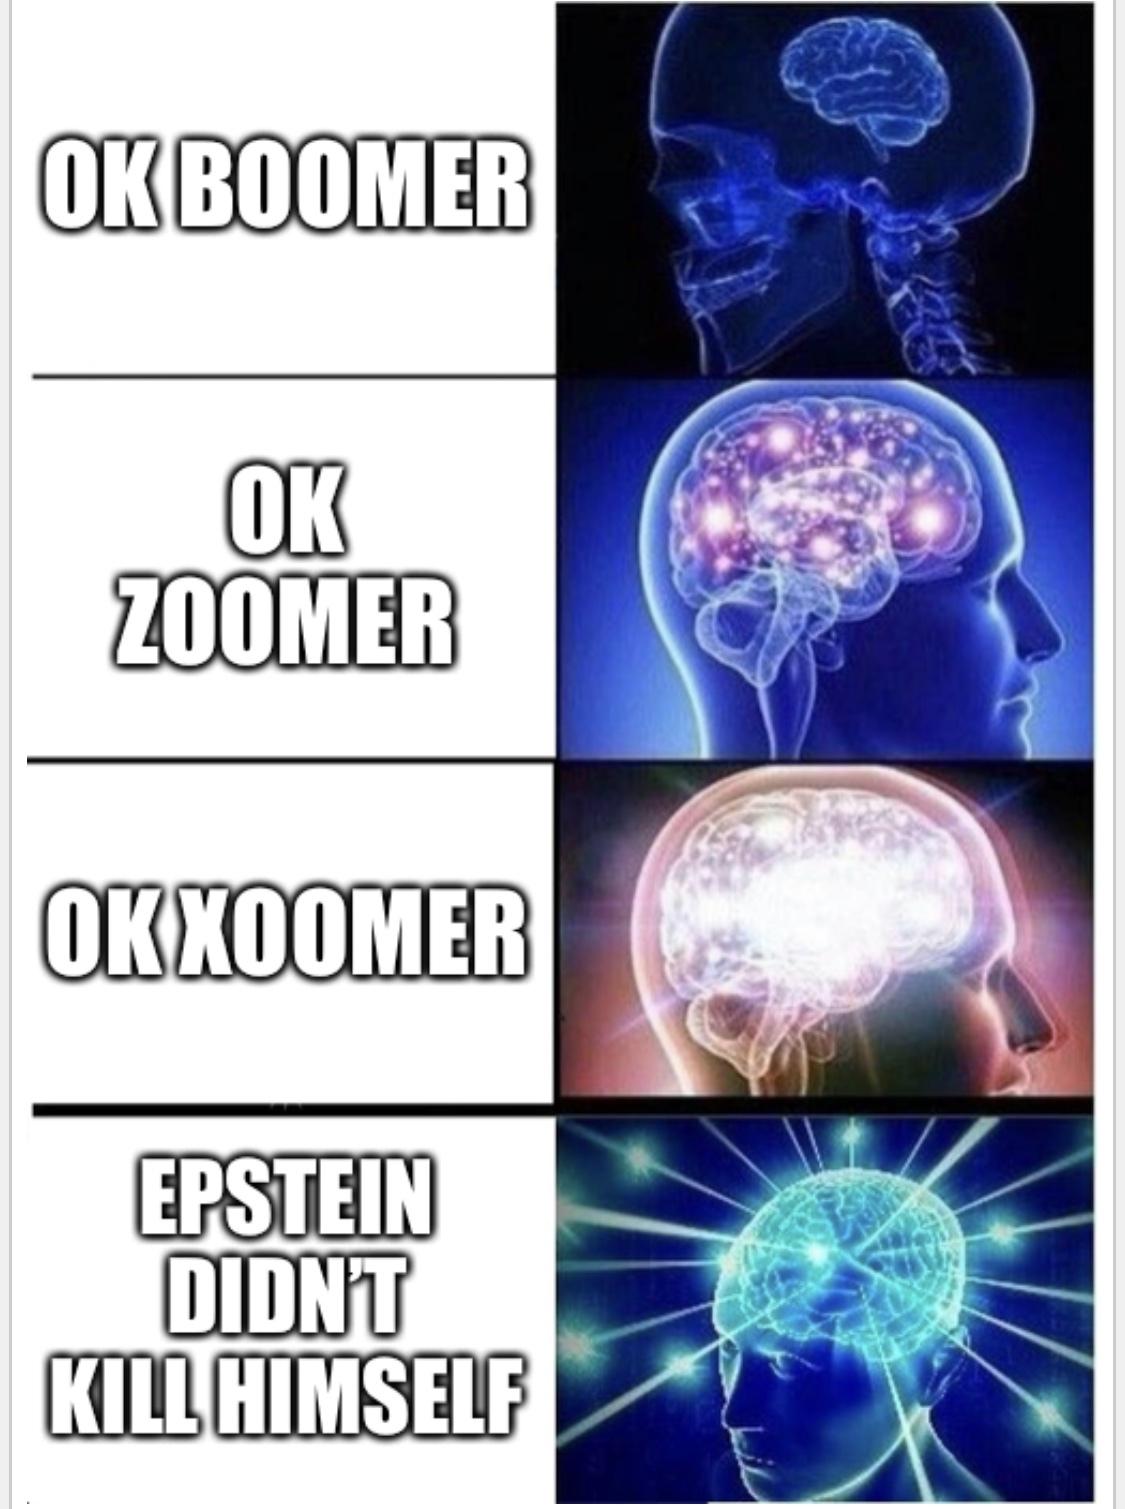 Memedroid rn